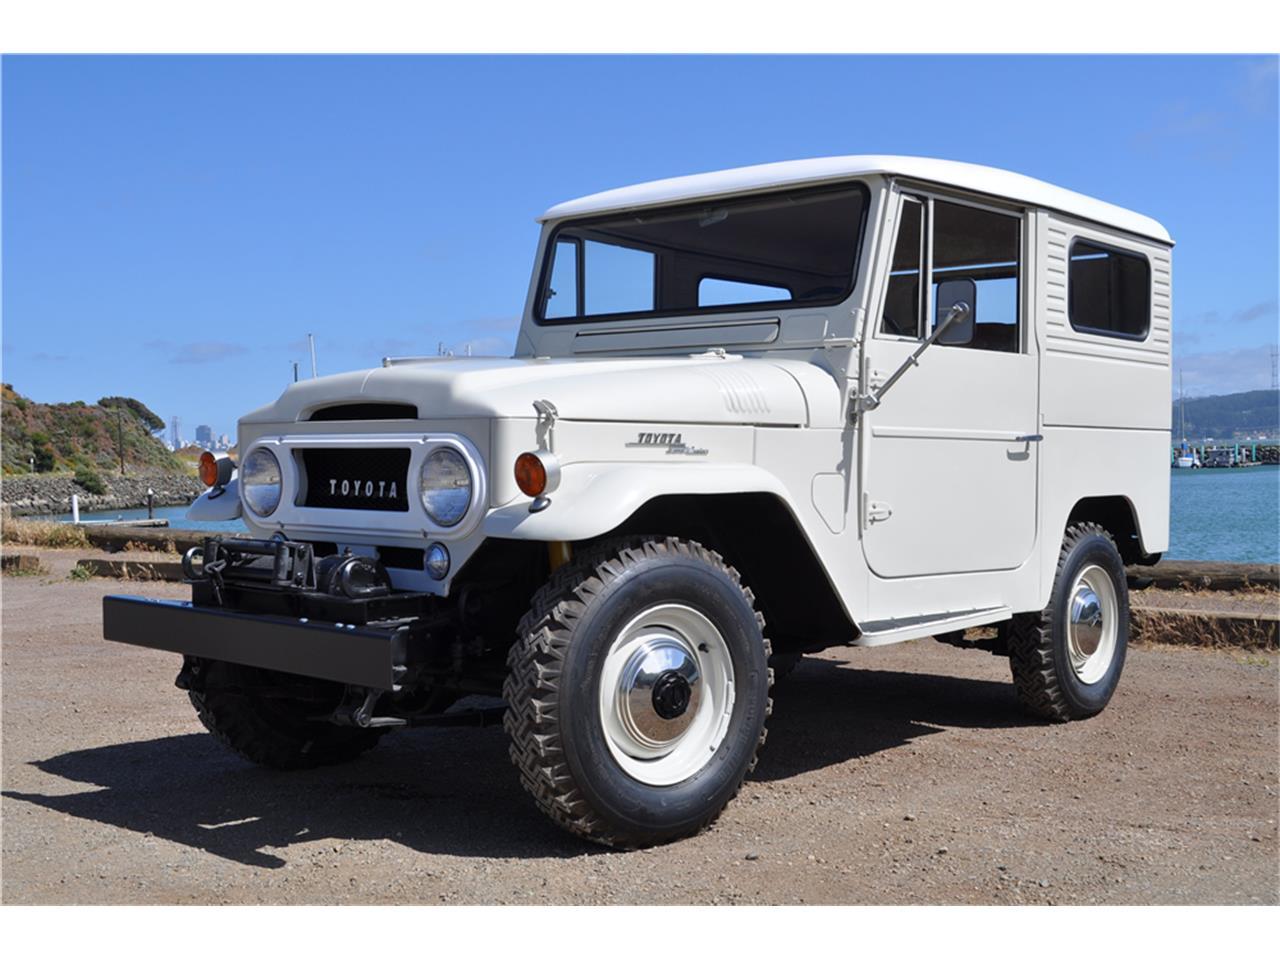 Toyota Fj40 For Sale >> 1965 Toyota Land Cruiser Fj40 For Sale Classiccars Com Cc 1113566